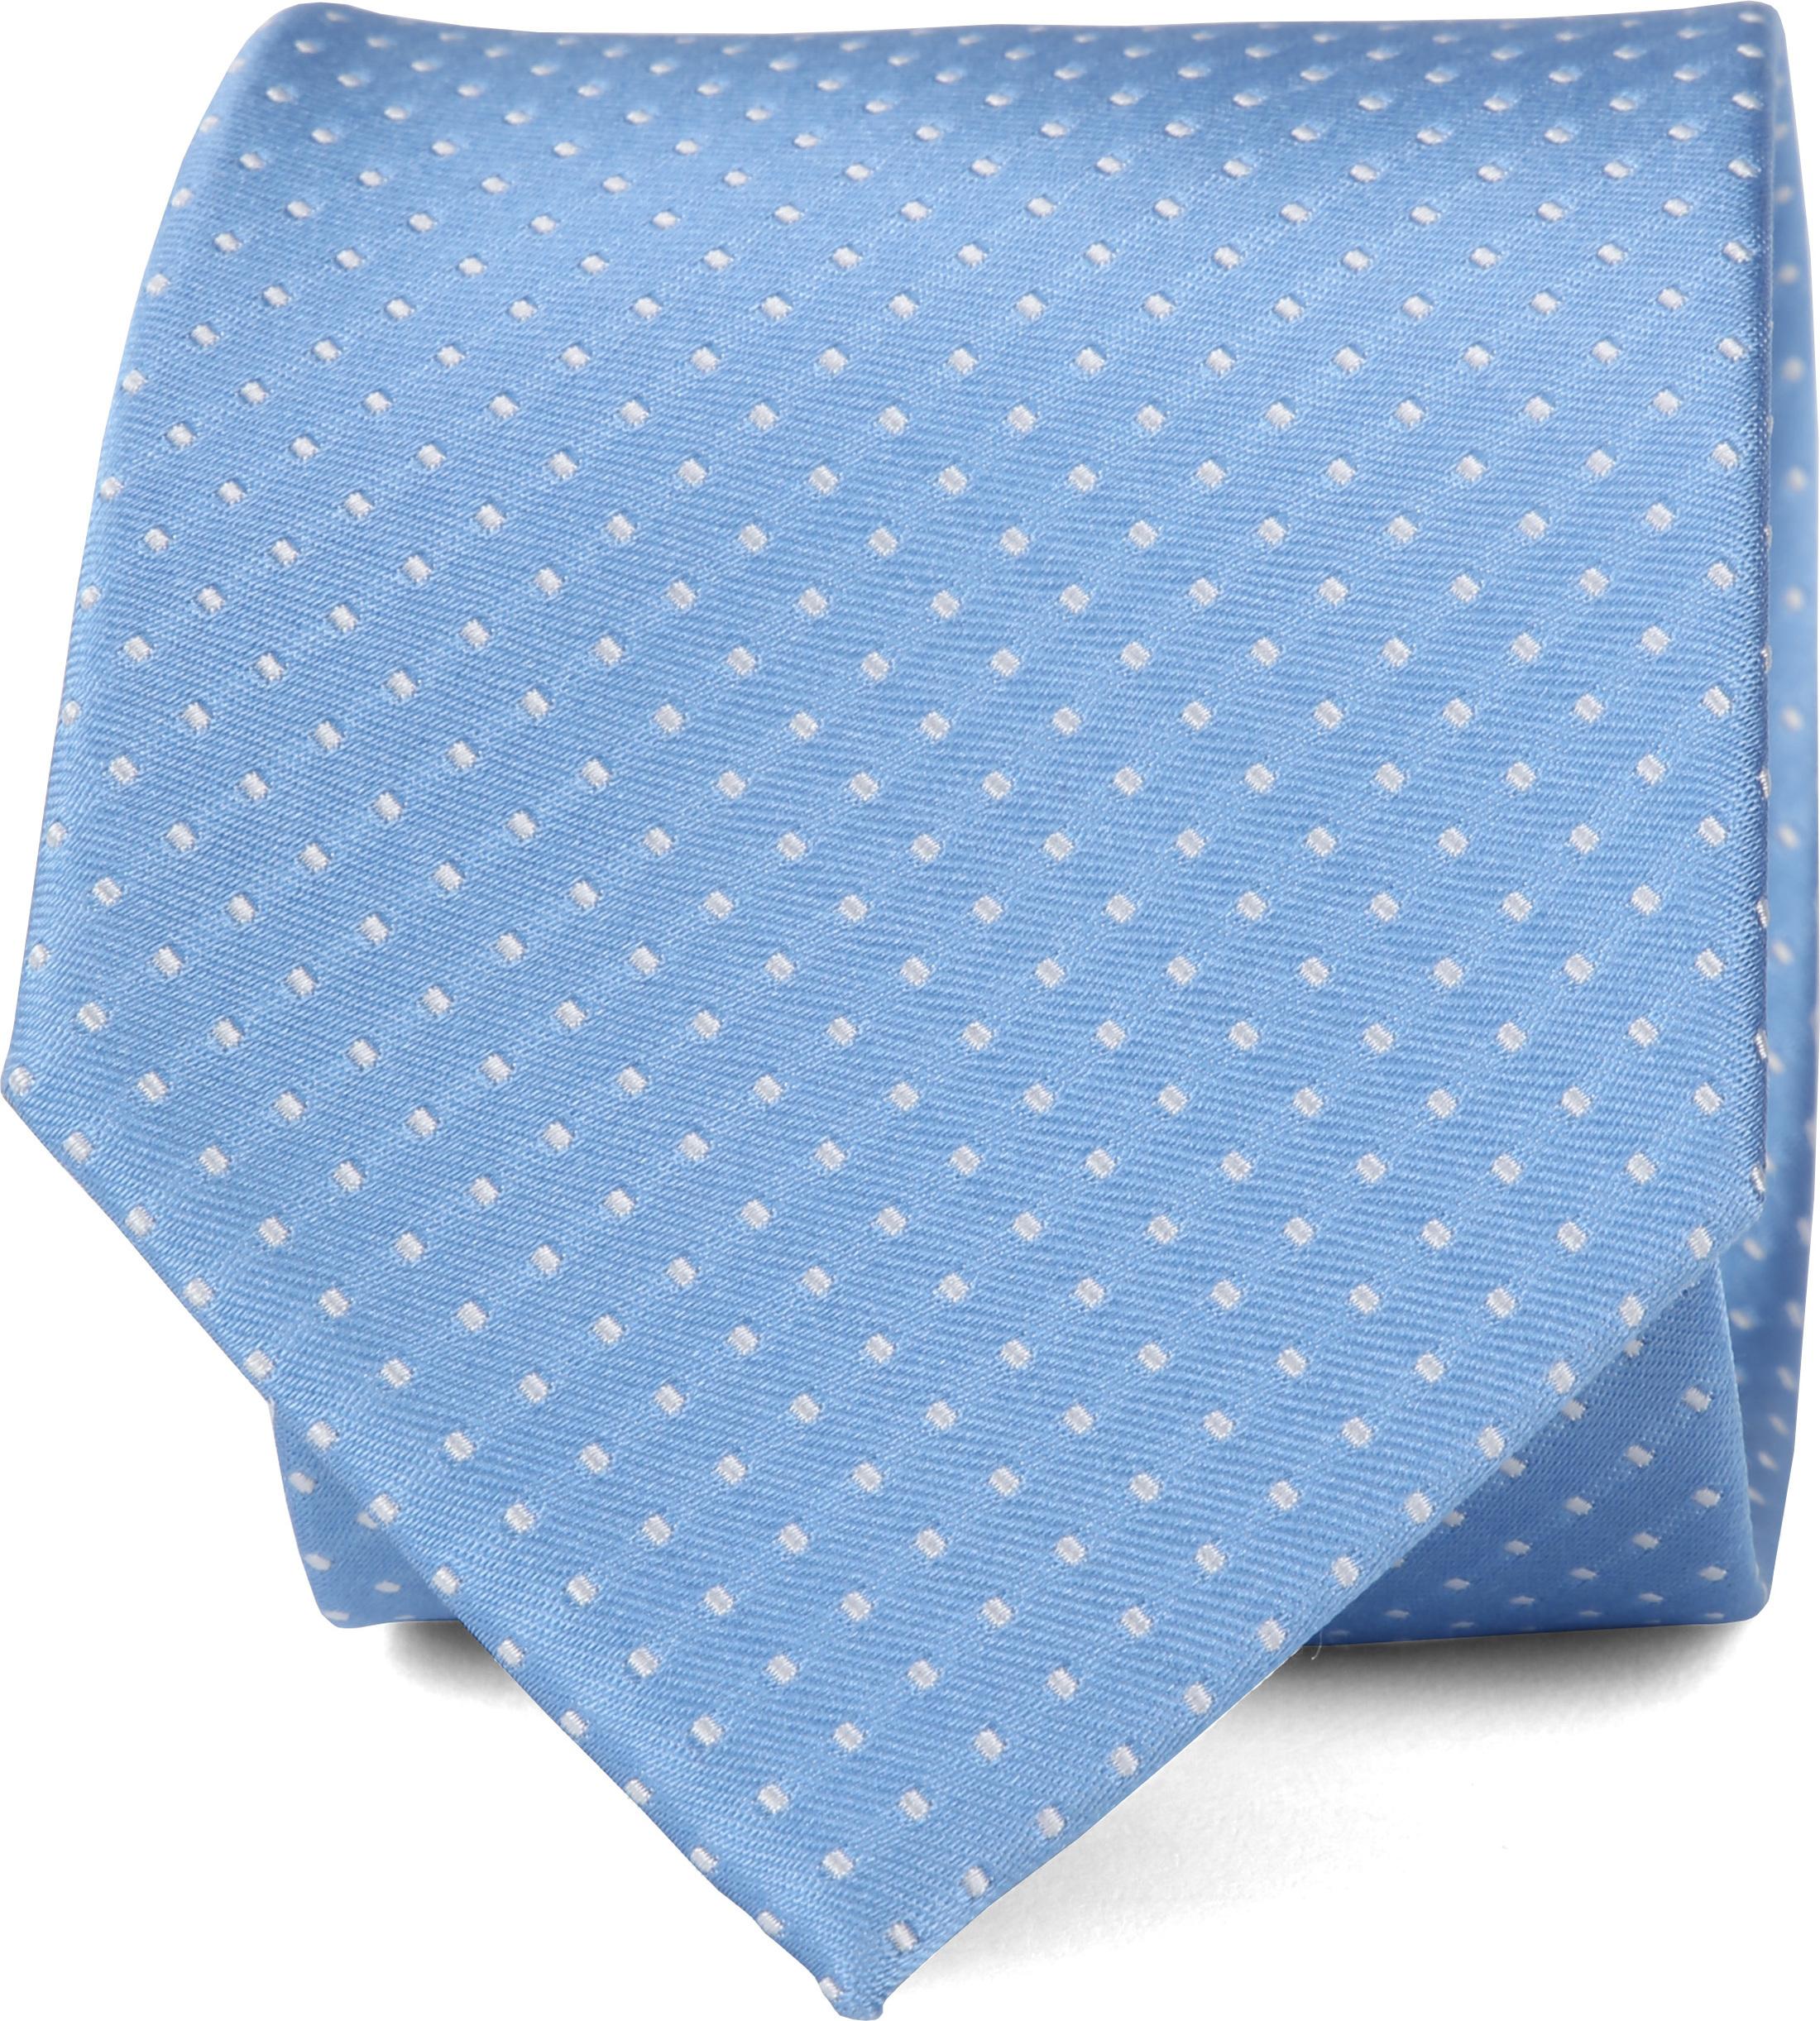 Suitable Krawatte Seide Blau F91-7 foto 0